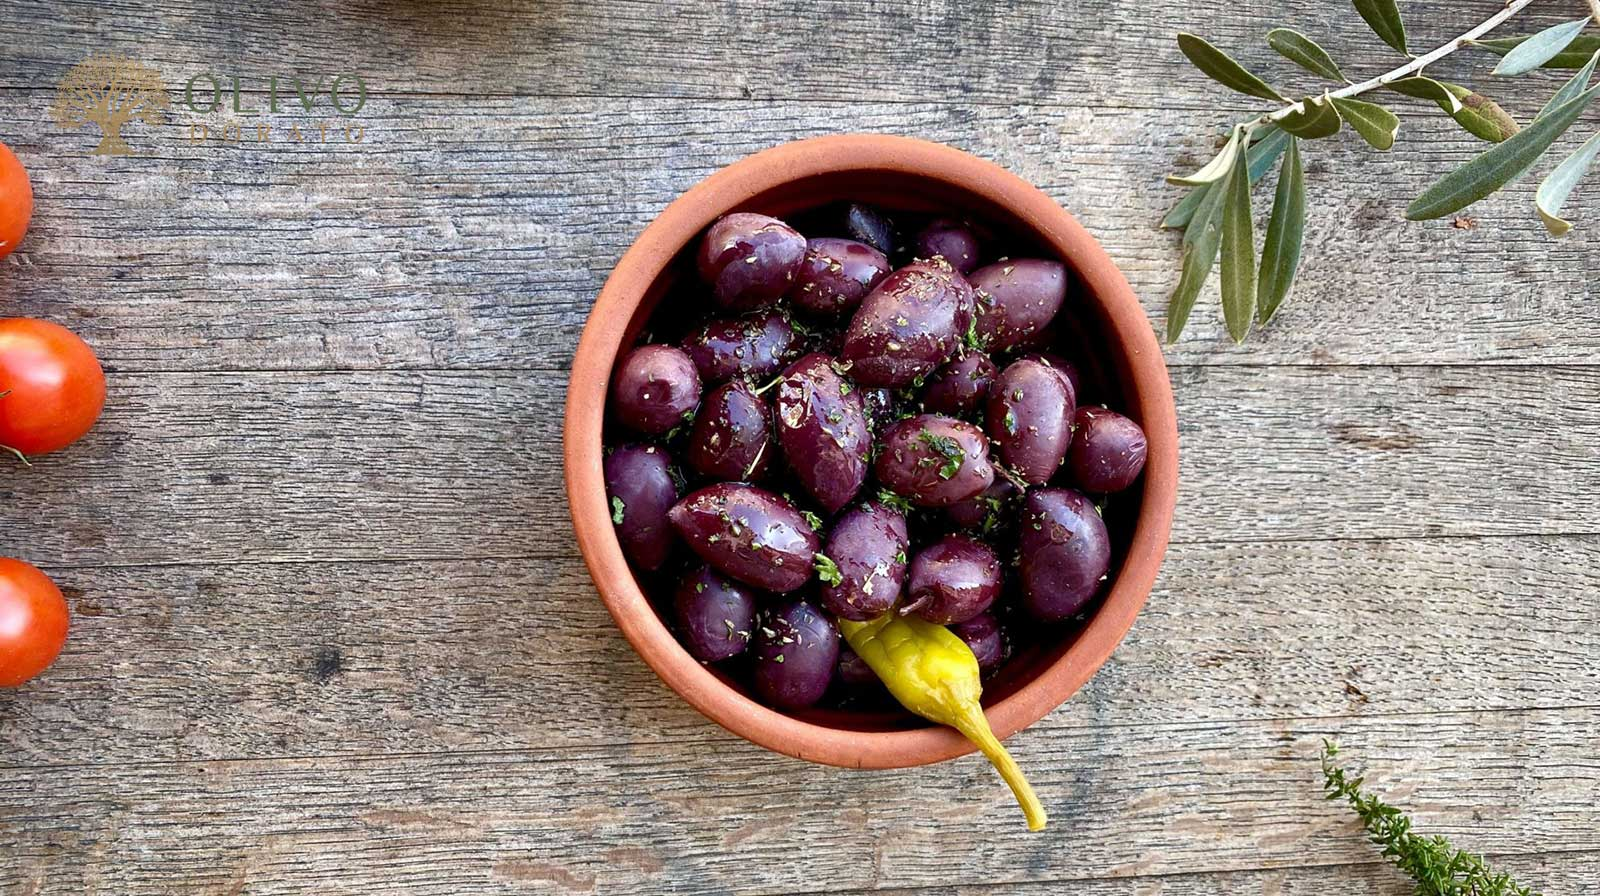 griechische Kalamata Oliven